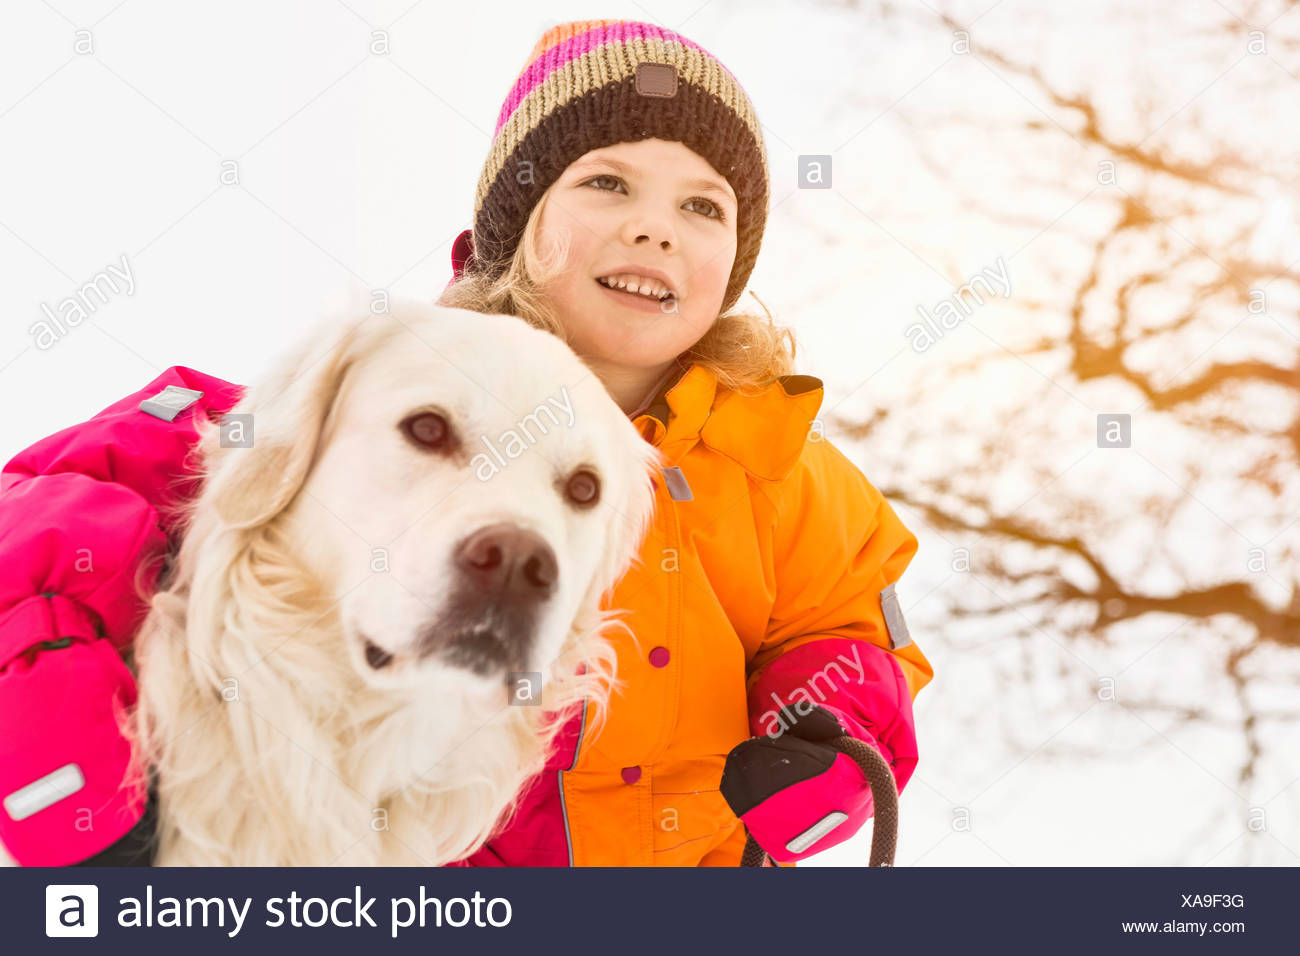 Mädchen mit Arm um Hund Stockbild